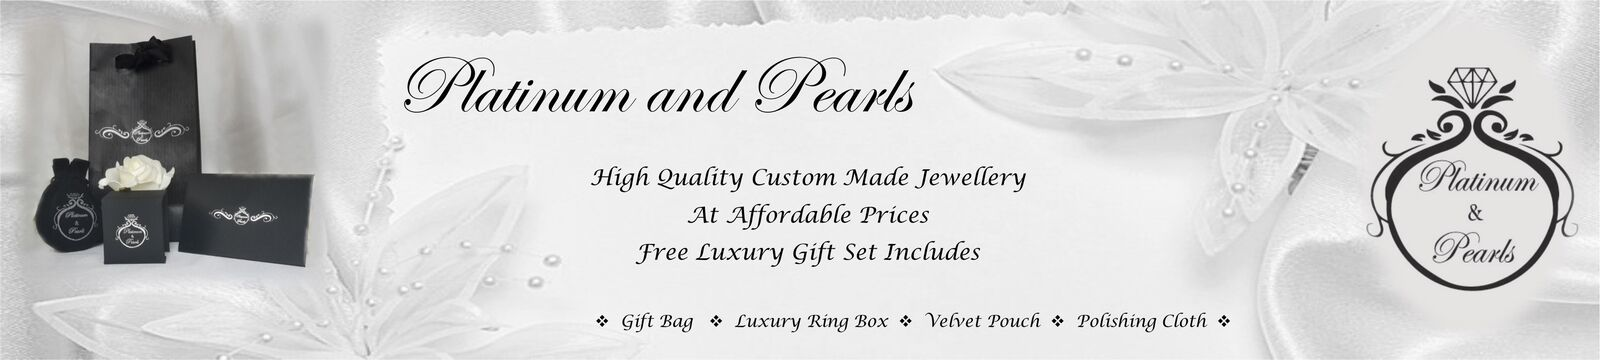 platinum-and-pearls